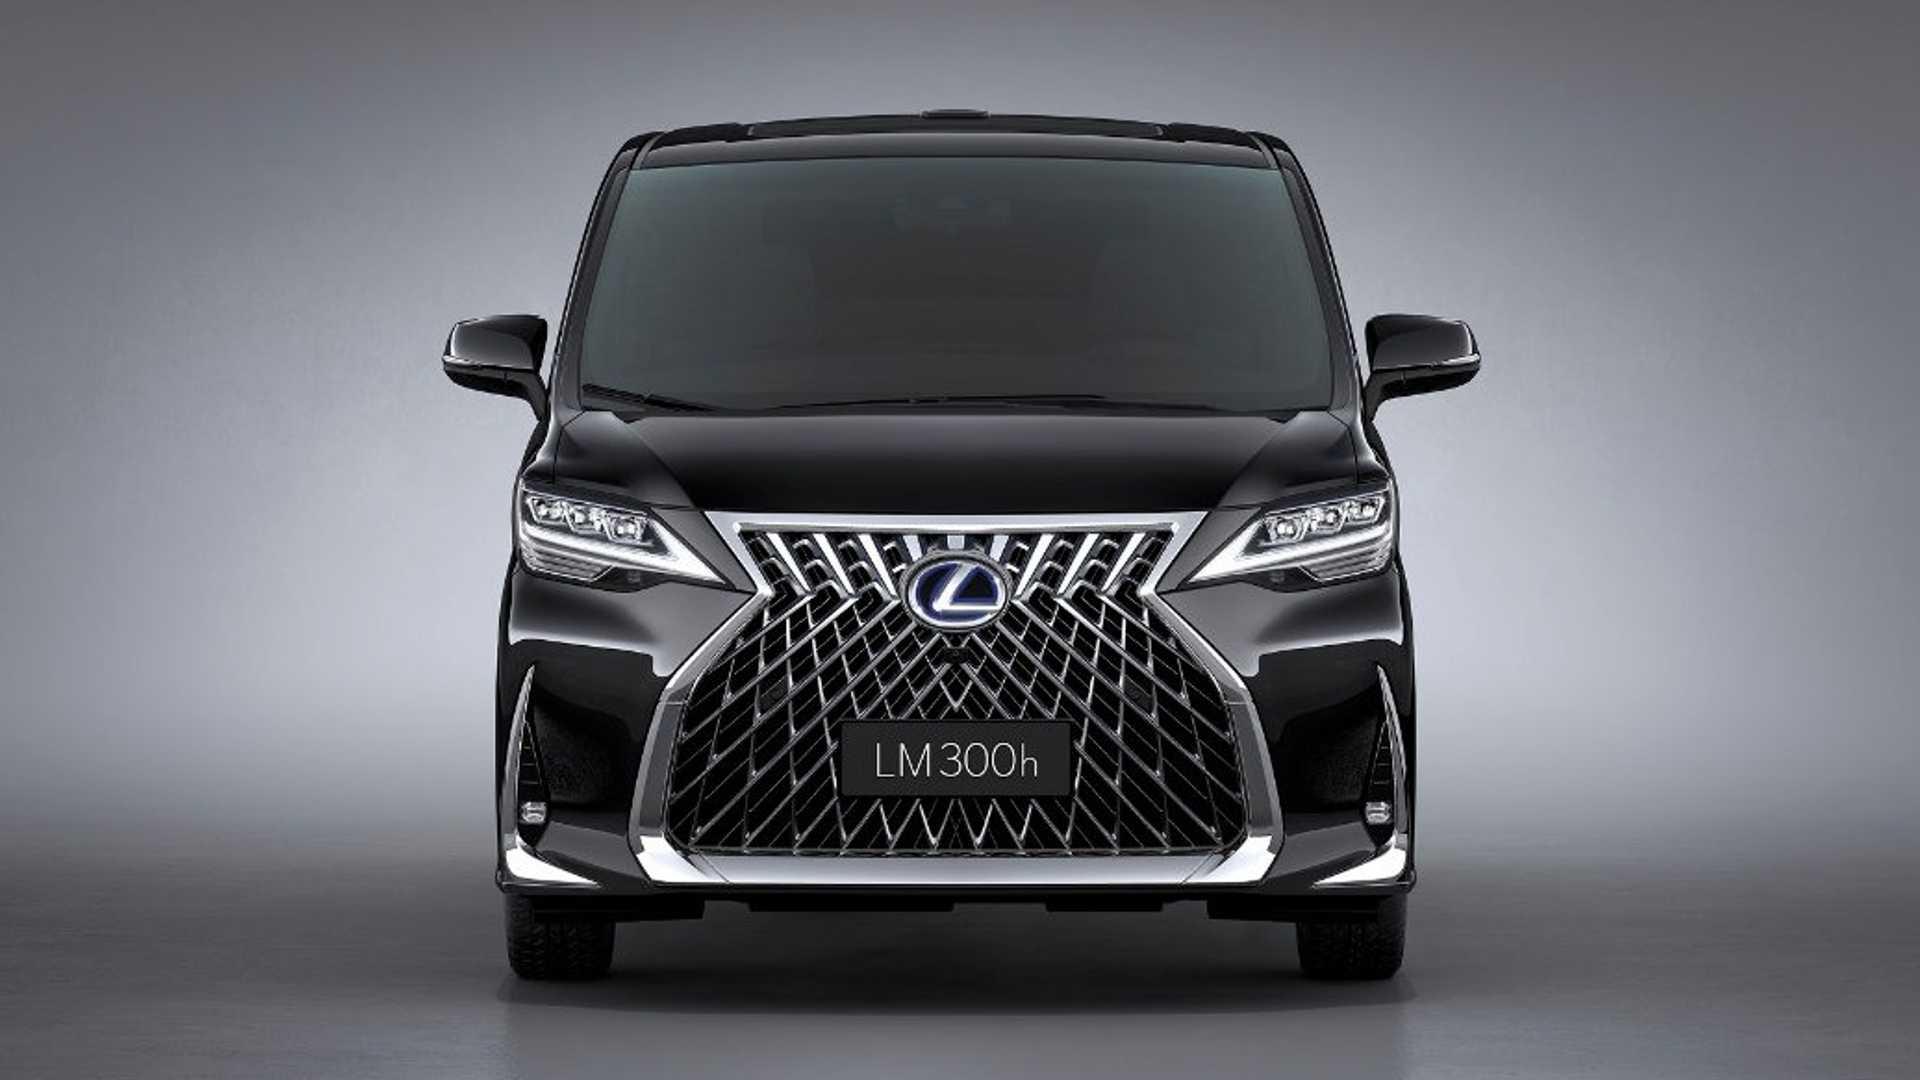 Lexus Lm Minivan Revealed At 2019 Shanghai Auto Show